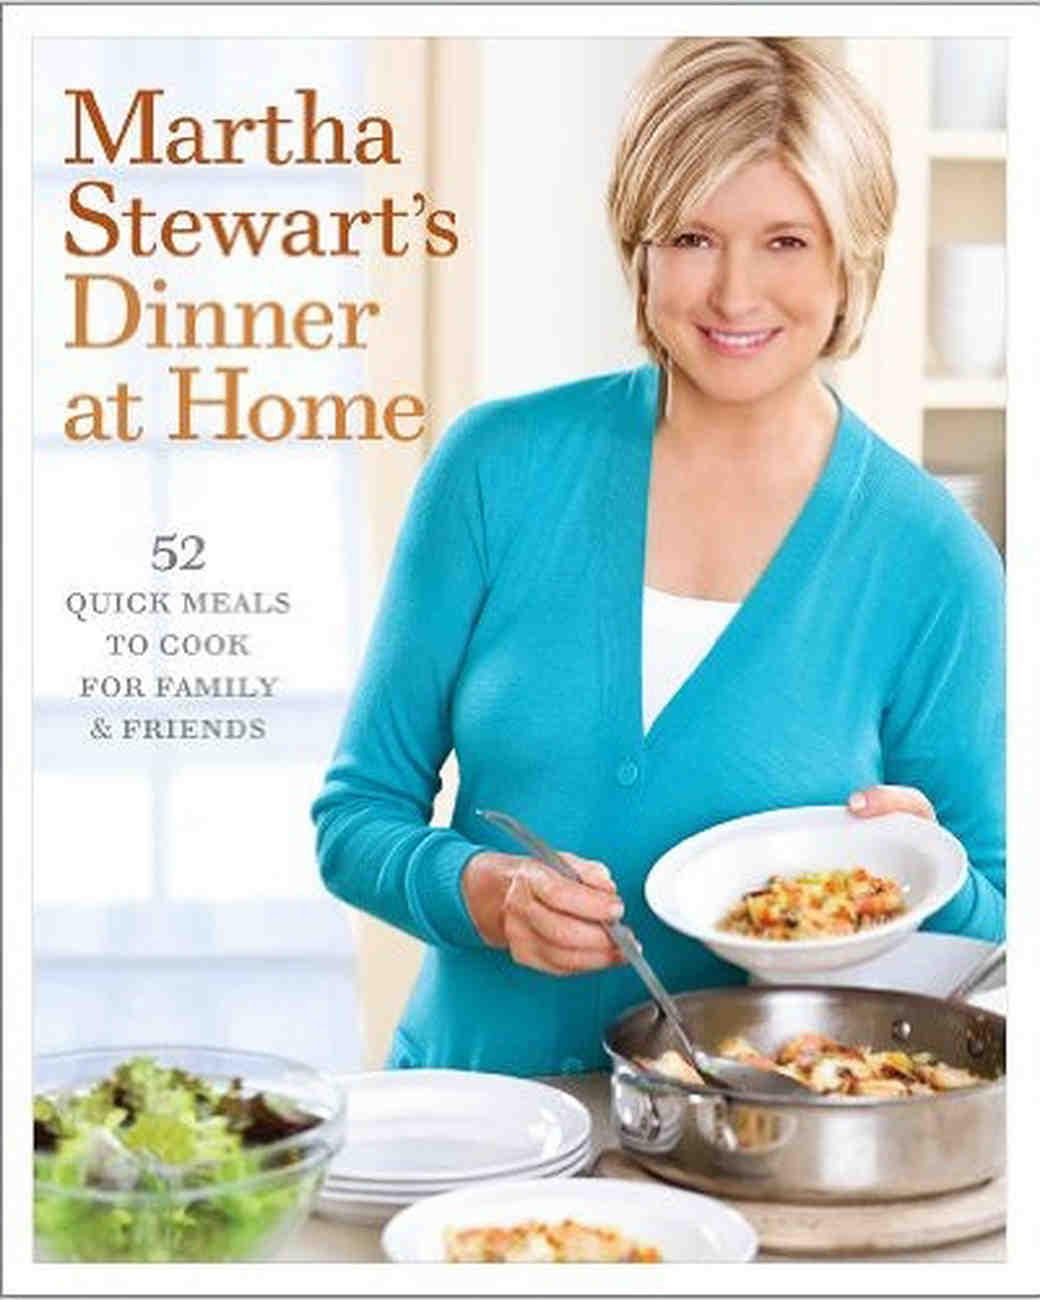 engagement-gifts-martha-cookbook-0316.jpg